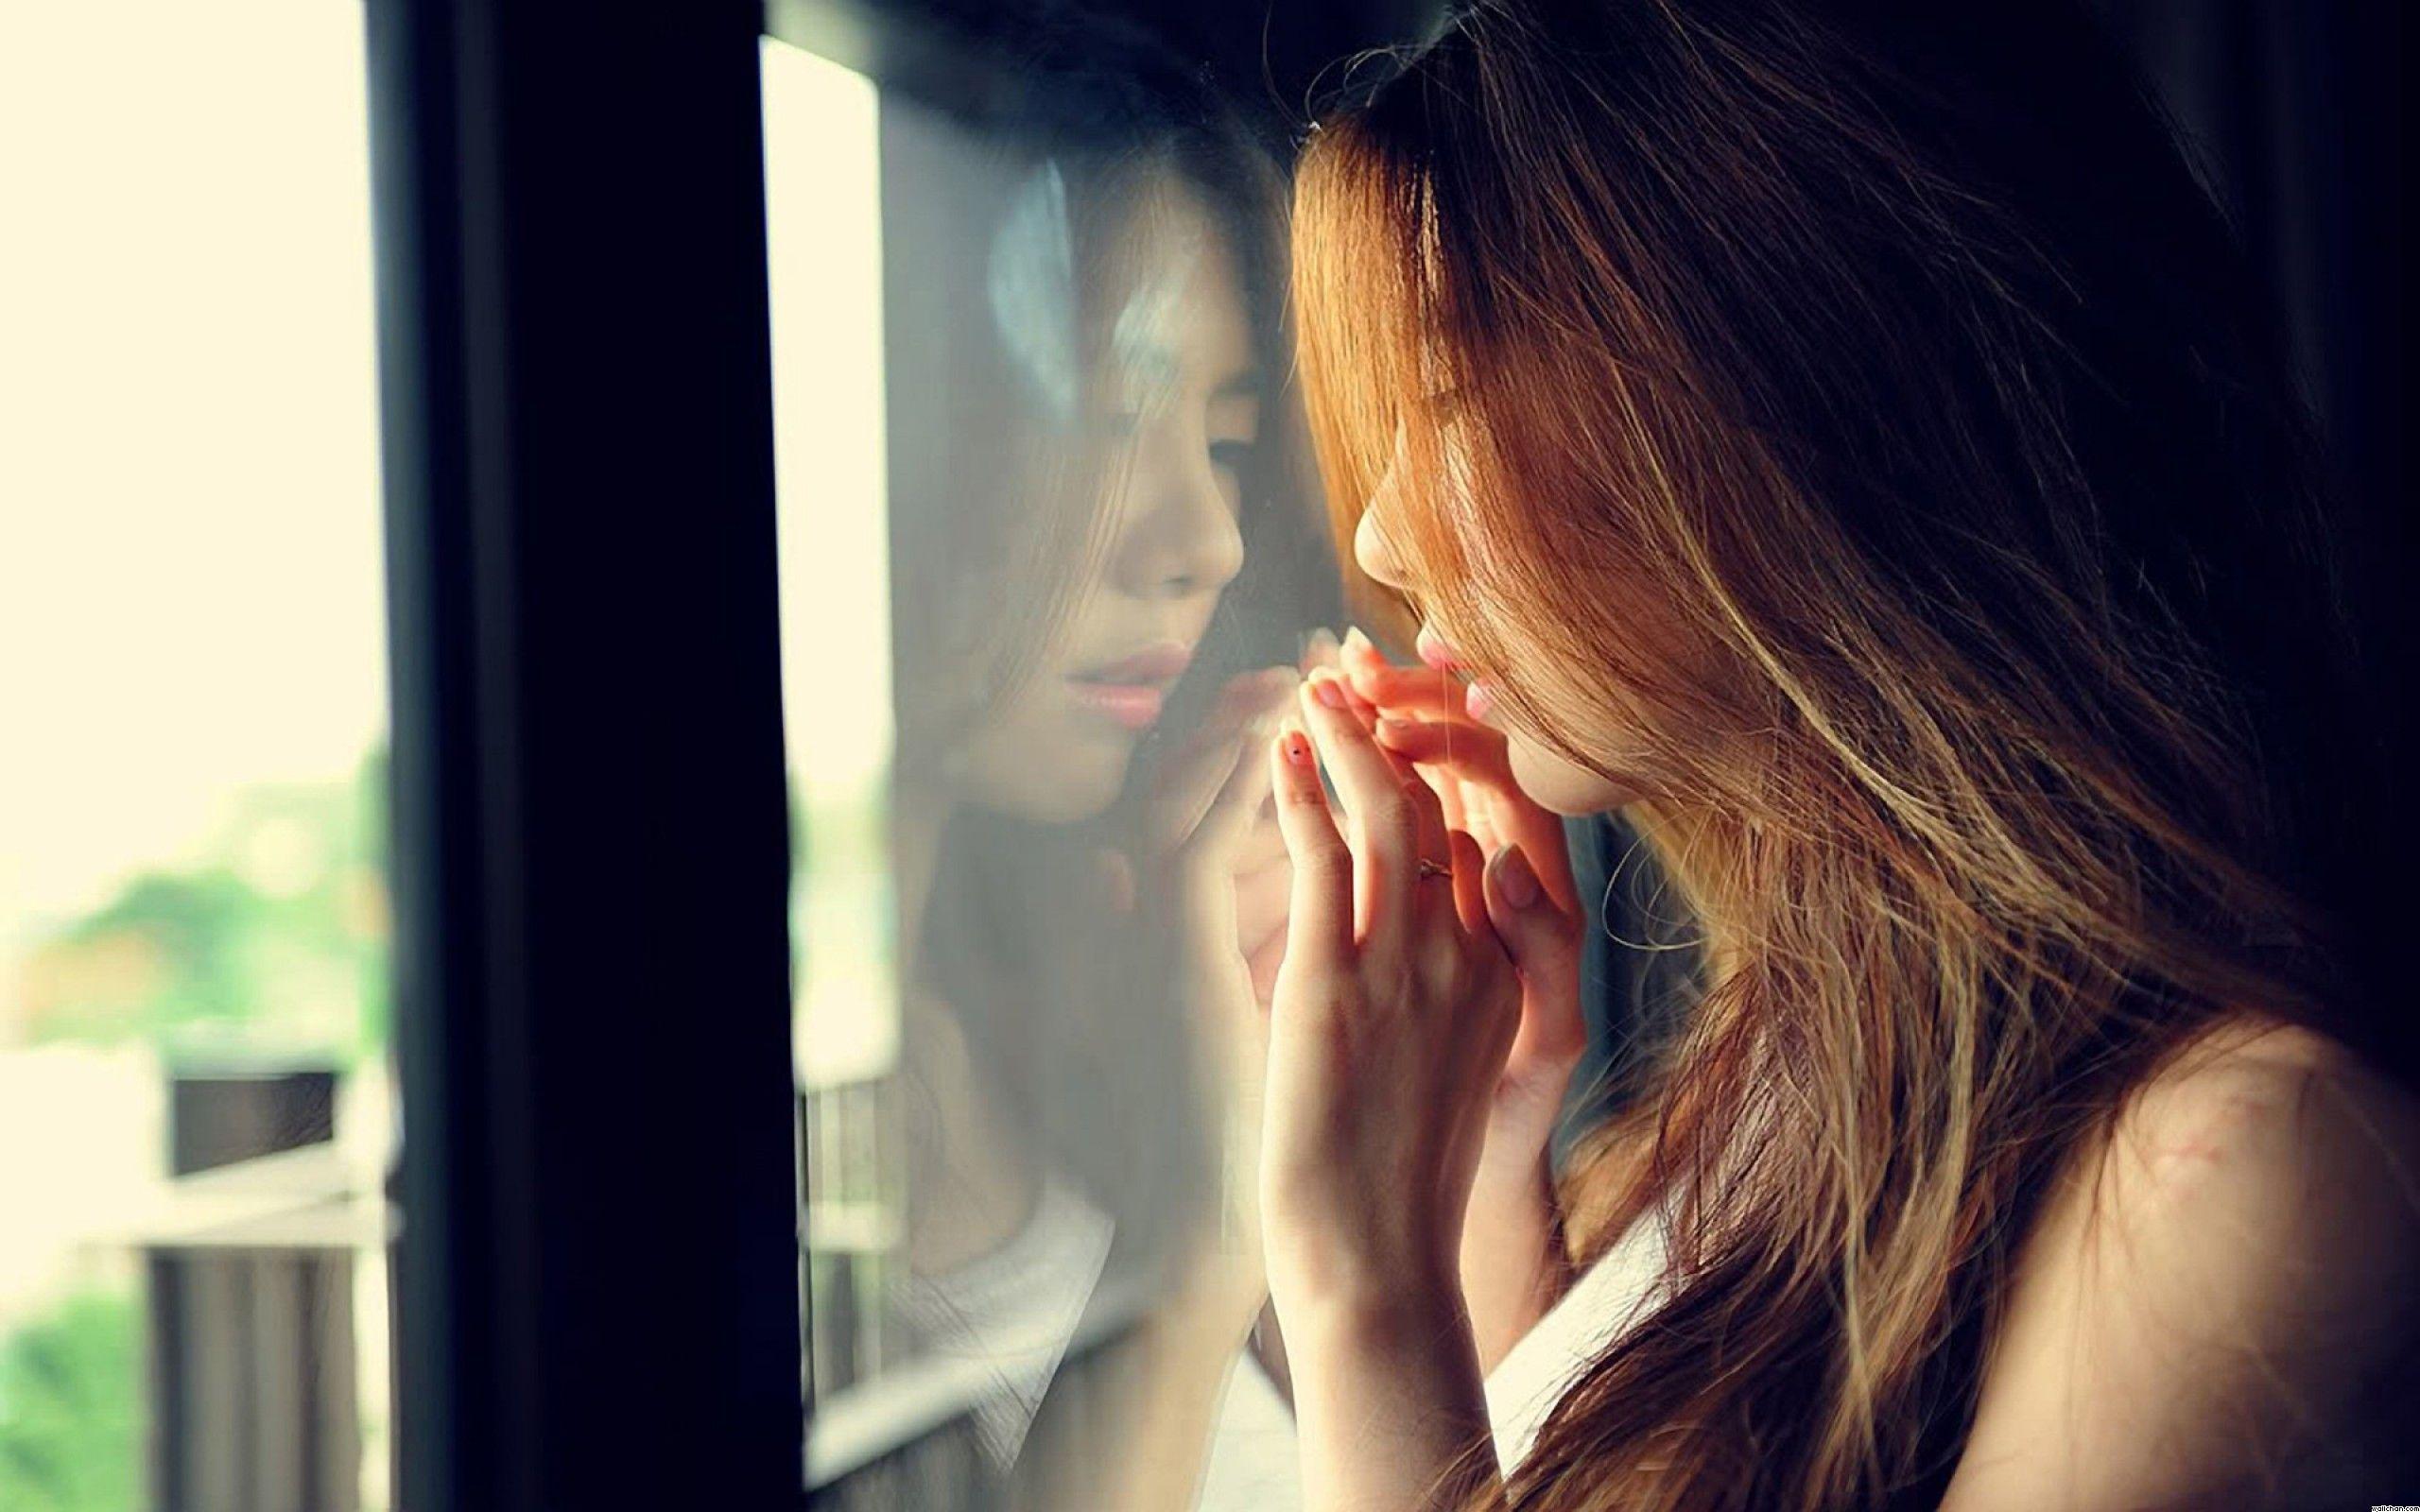 Sad Girl Alone Wallpaper HD Images 6c63p9fm Yoanu 2560x1600